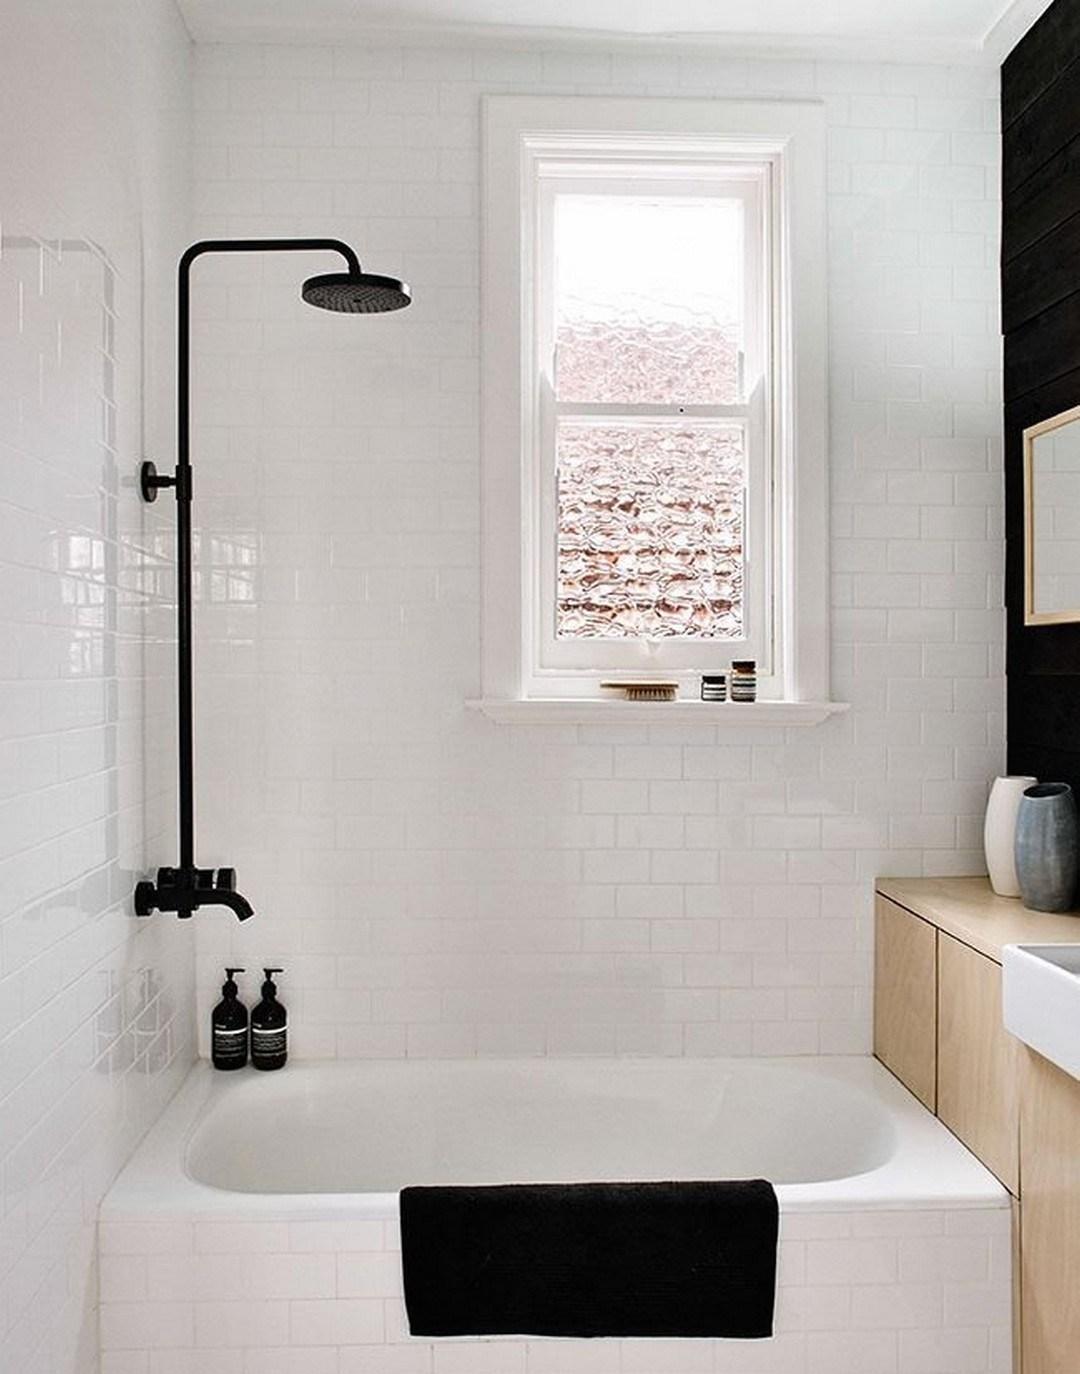 Ванная 4 кв м лофт